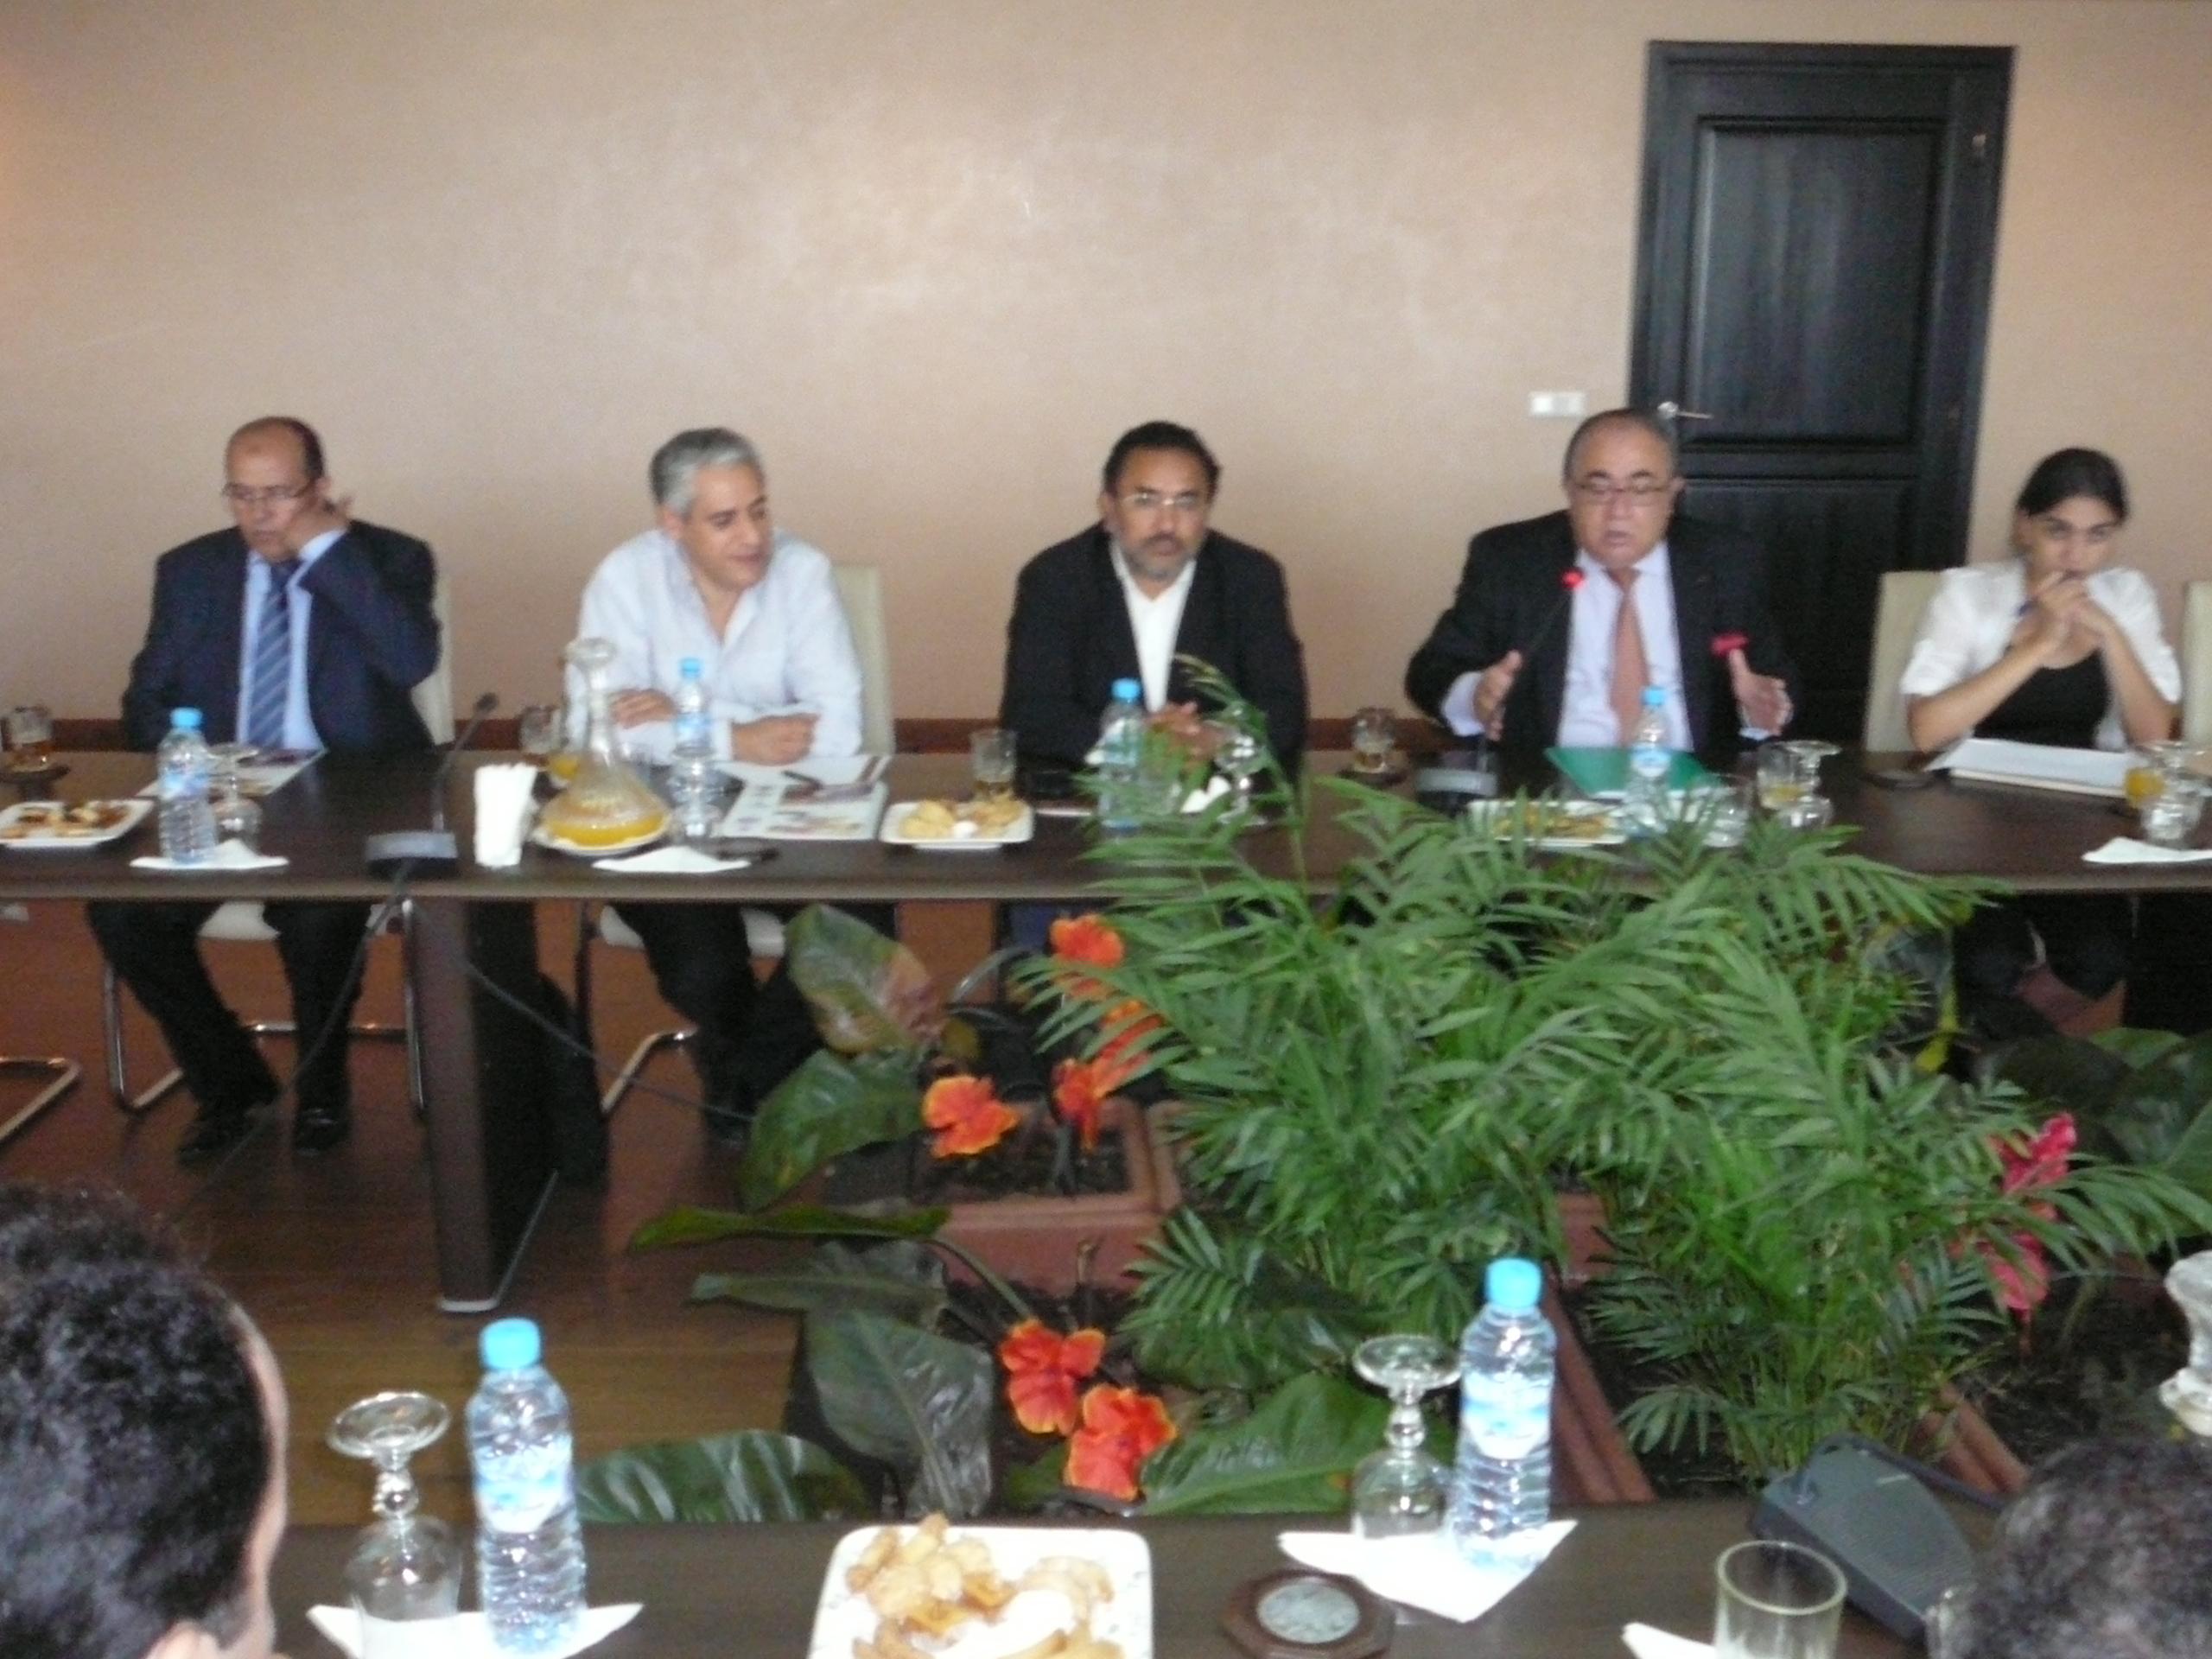 Chilehalal & Koutoubia Holding Invitan al embajador de Chile en Marruecos